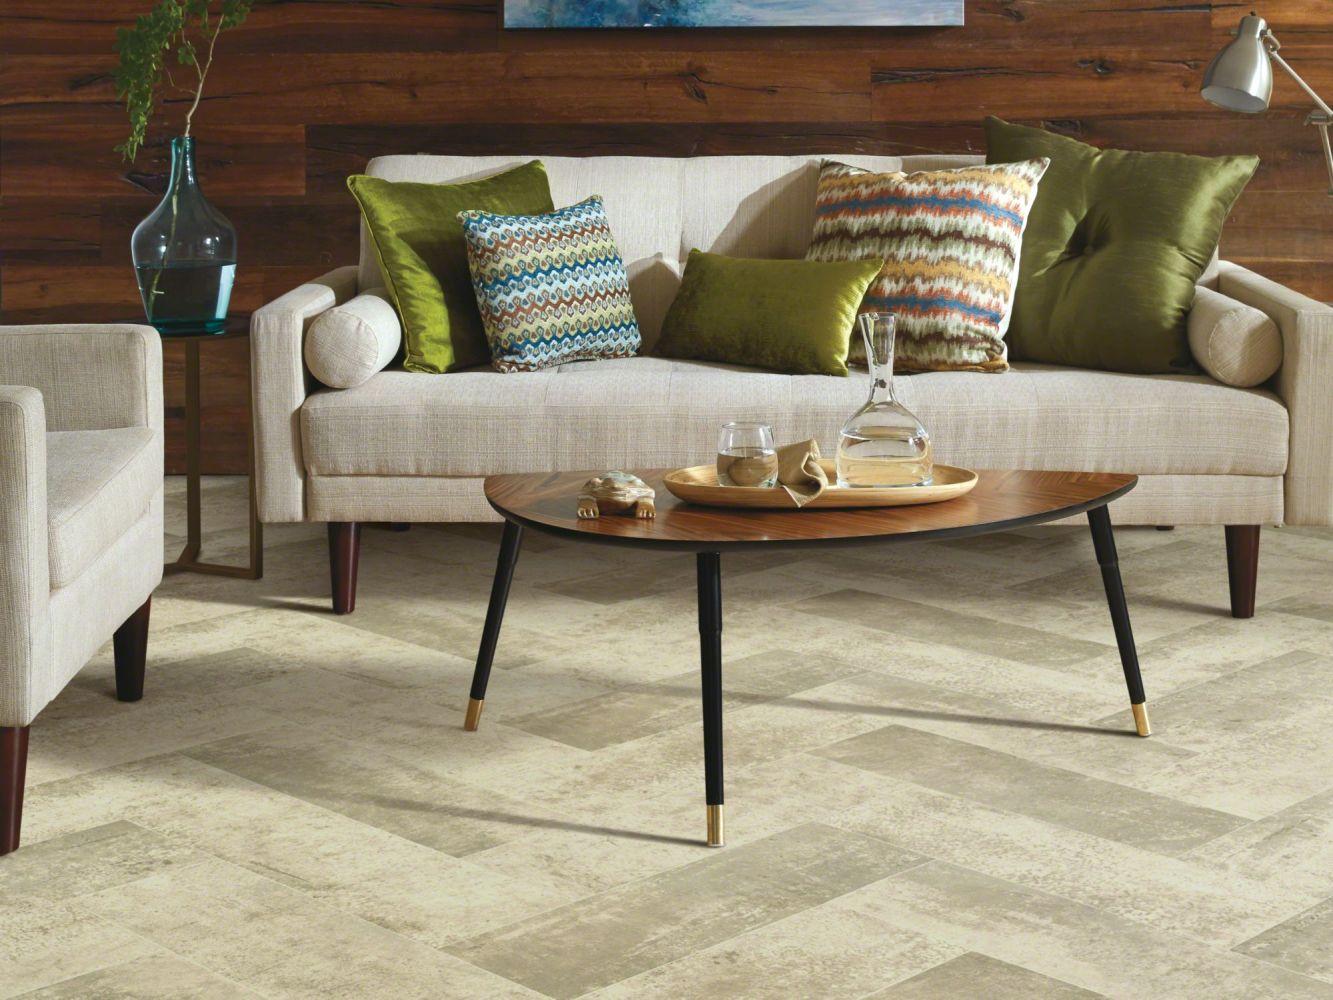 Shaw Floors Vinyl Residential Ares Delos 00107_SA625